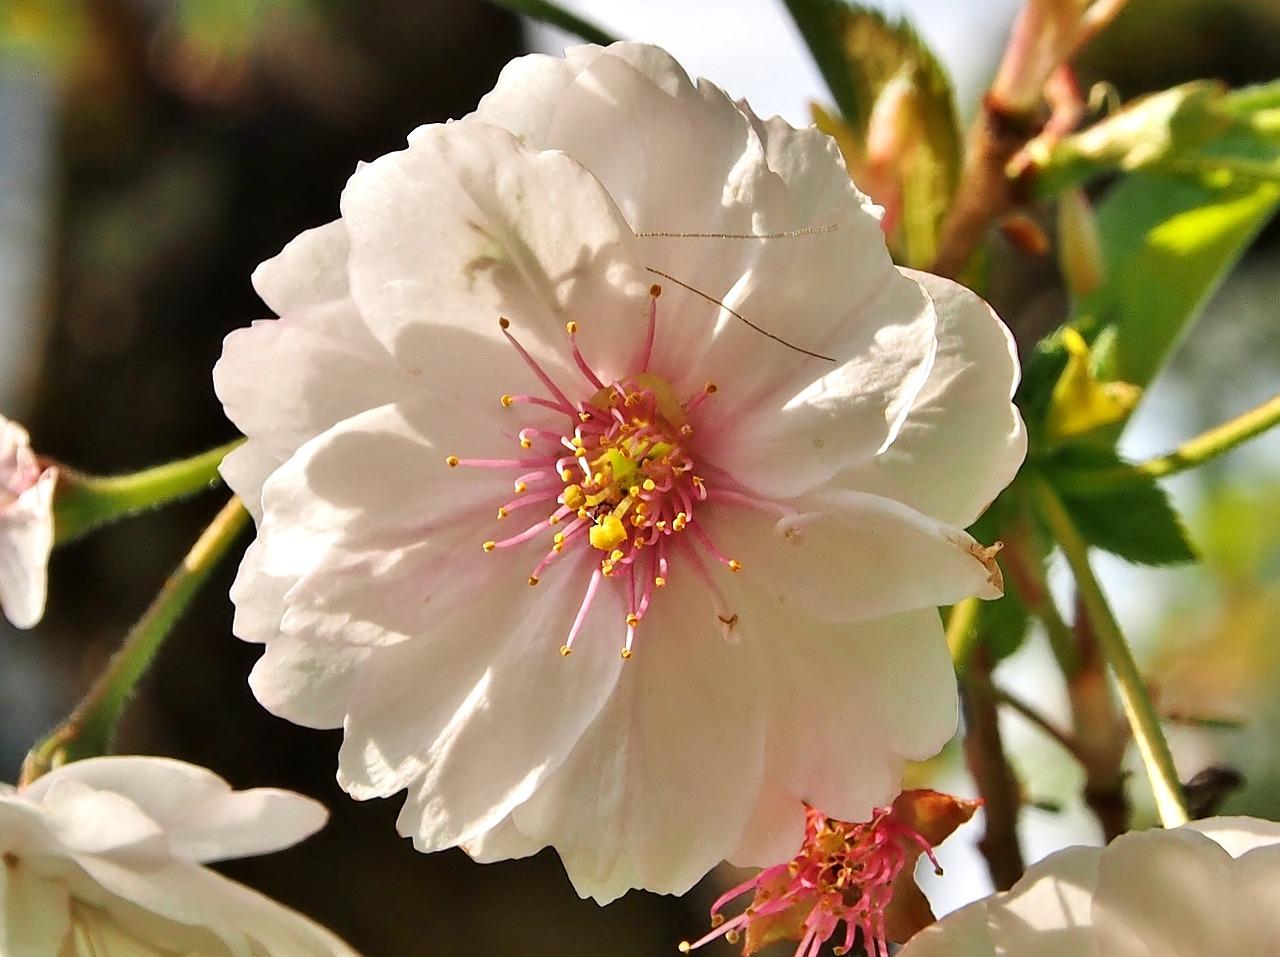 Blossombloomcherry Blossomwhite Pink Flowerjapanese Cherry